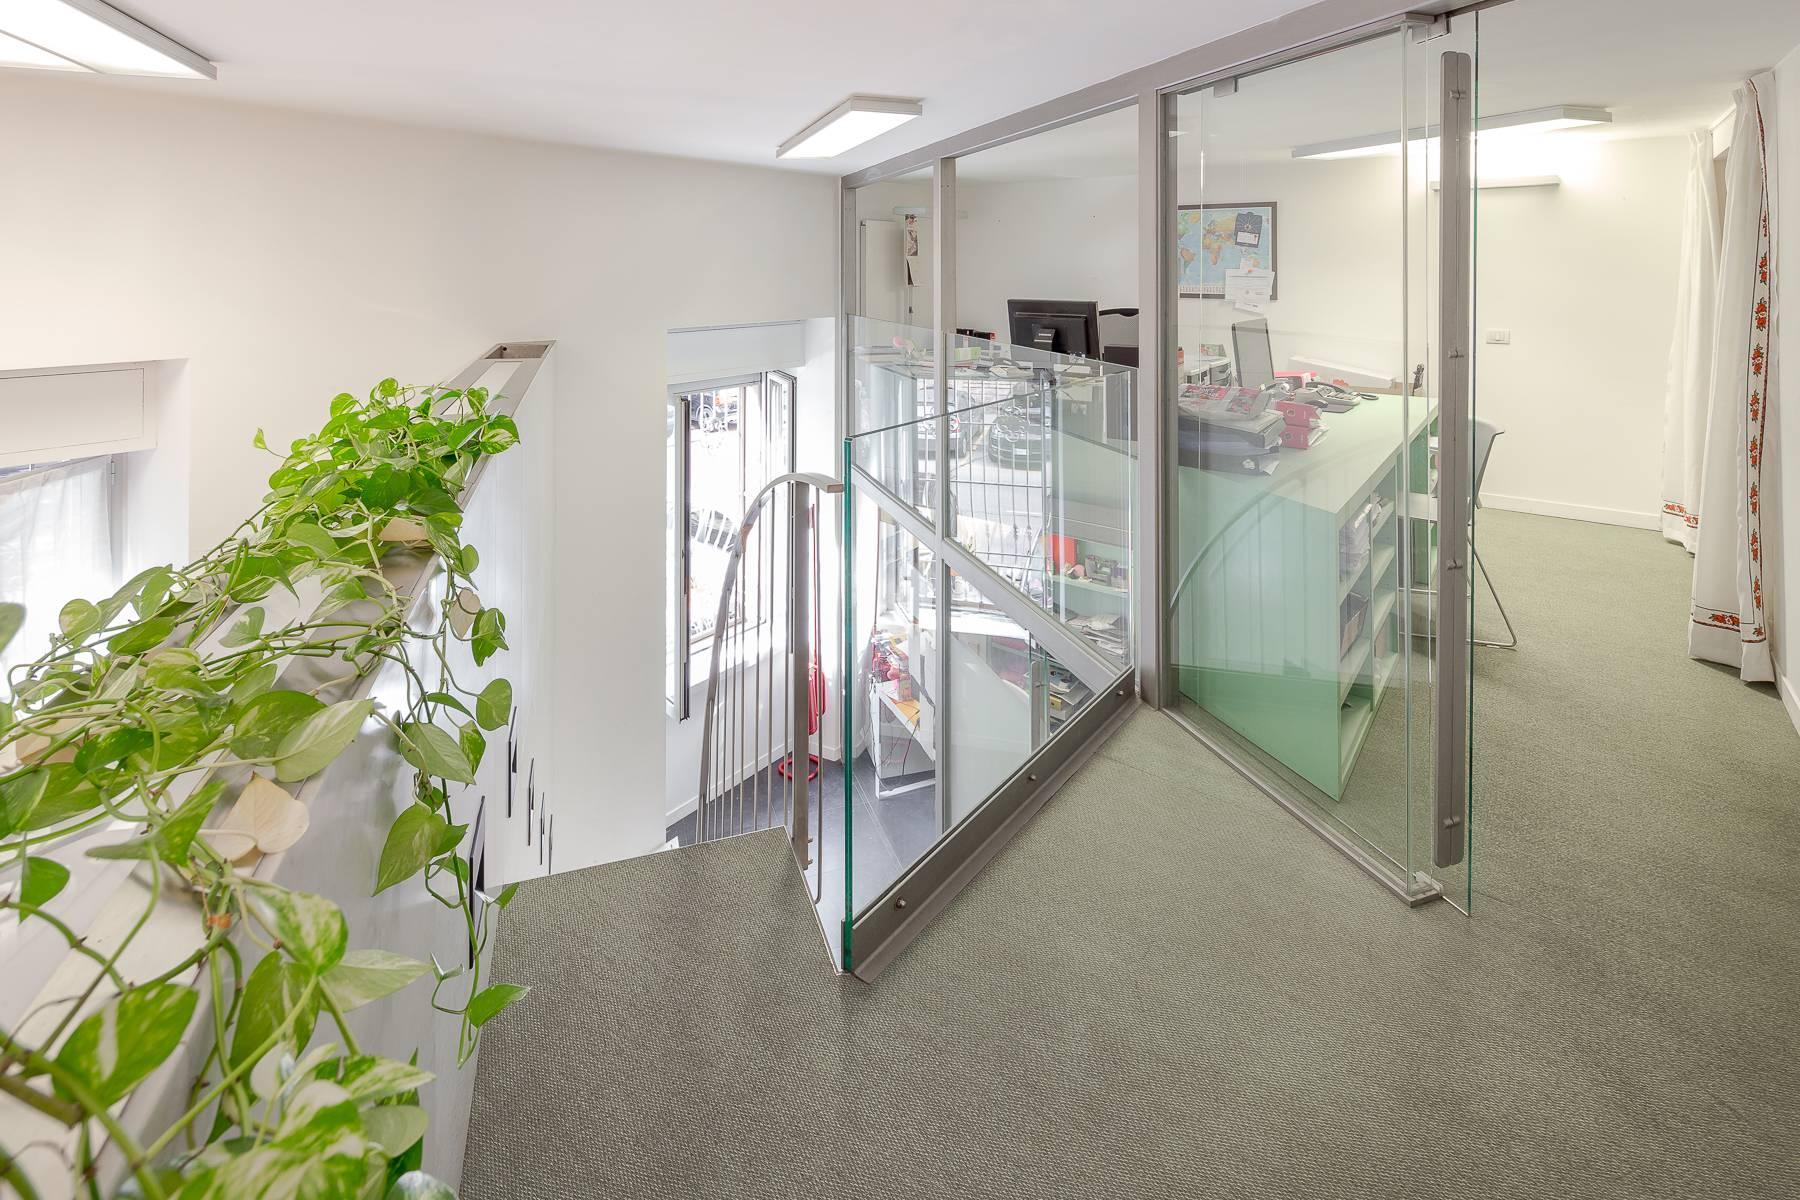 Open space office/residential property in Piazza Giovine Italia/Via Aurelio Saffi - 16